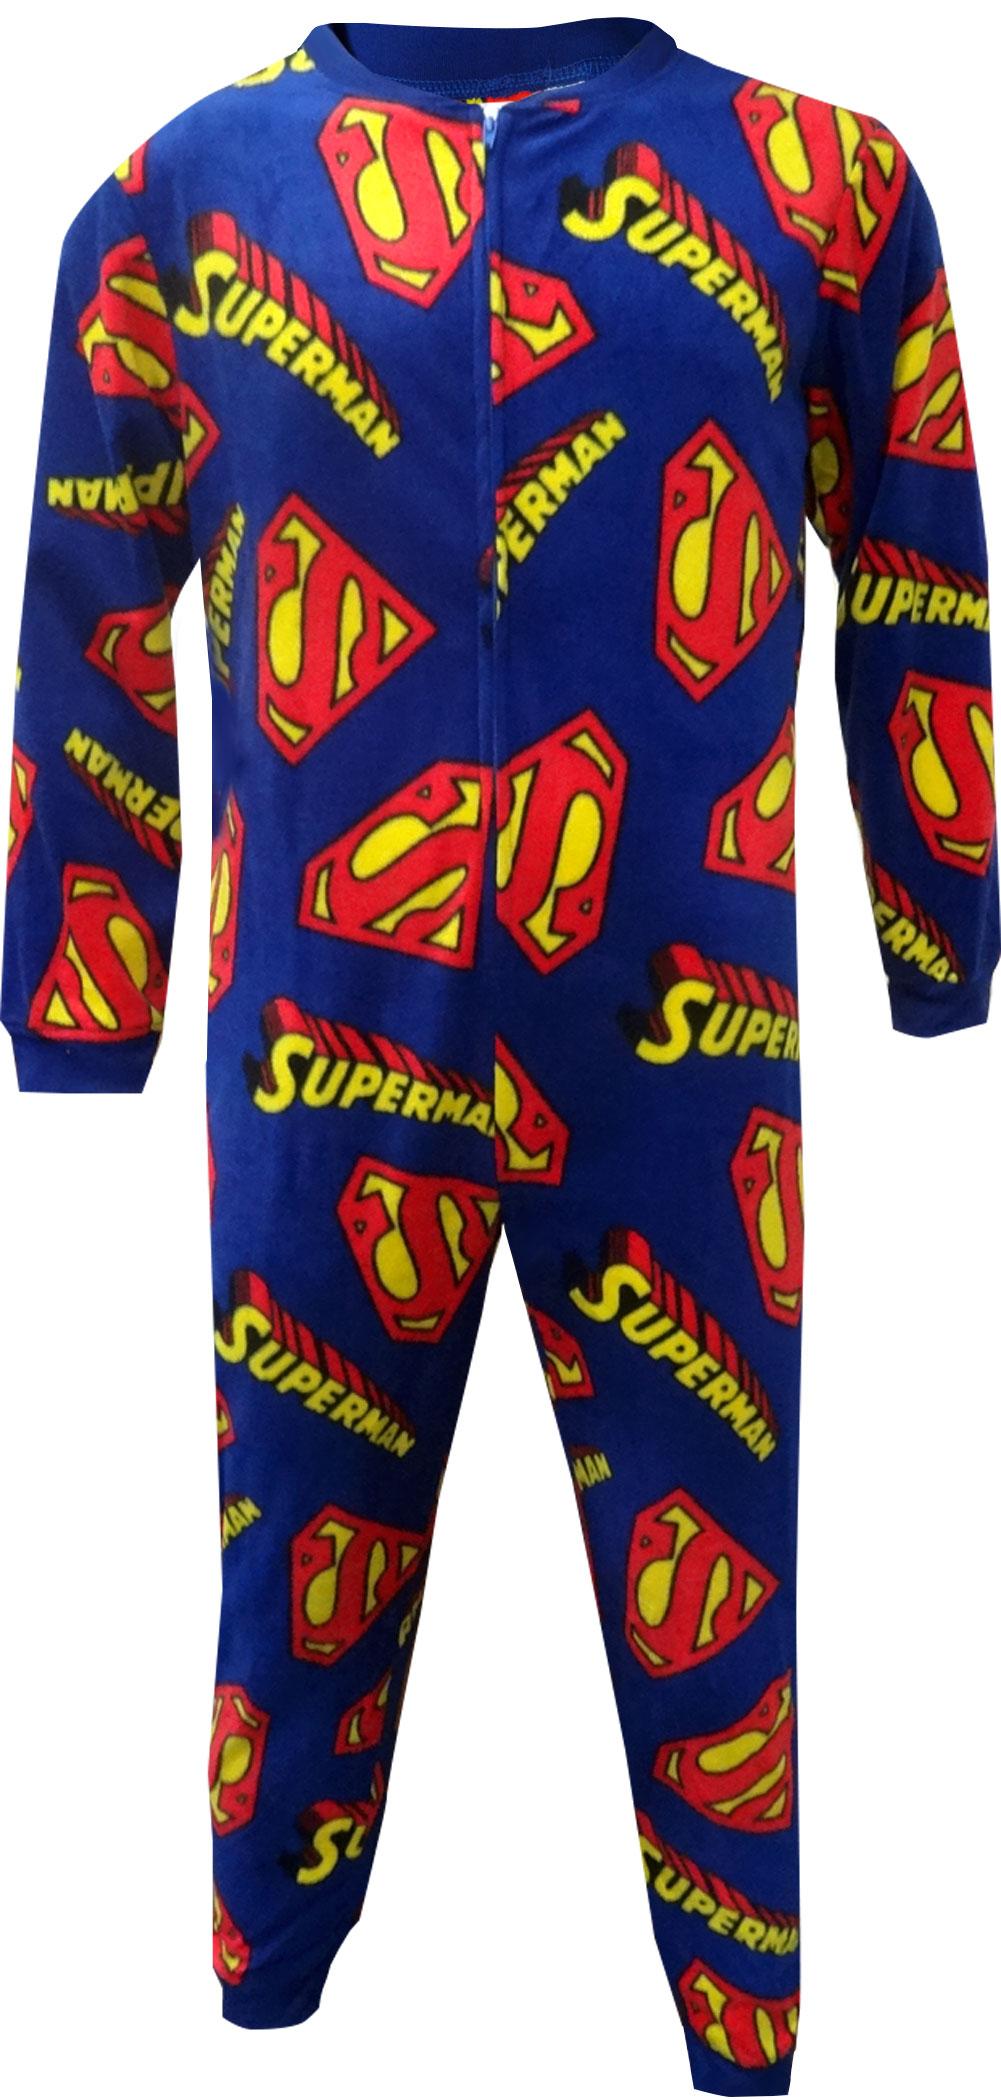 Superman Logos All Over Fleece Union Suit Pajama for men